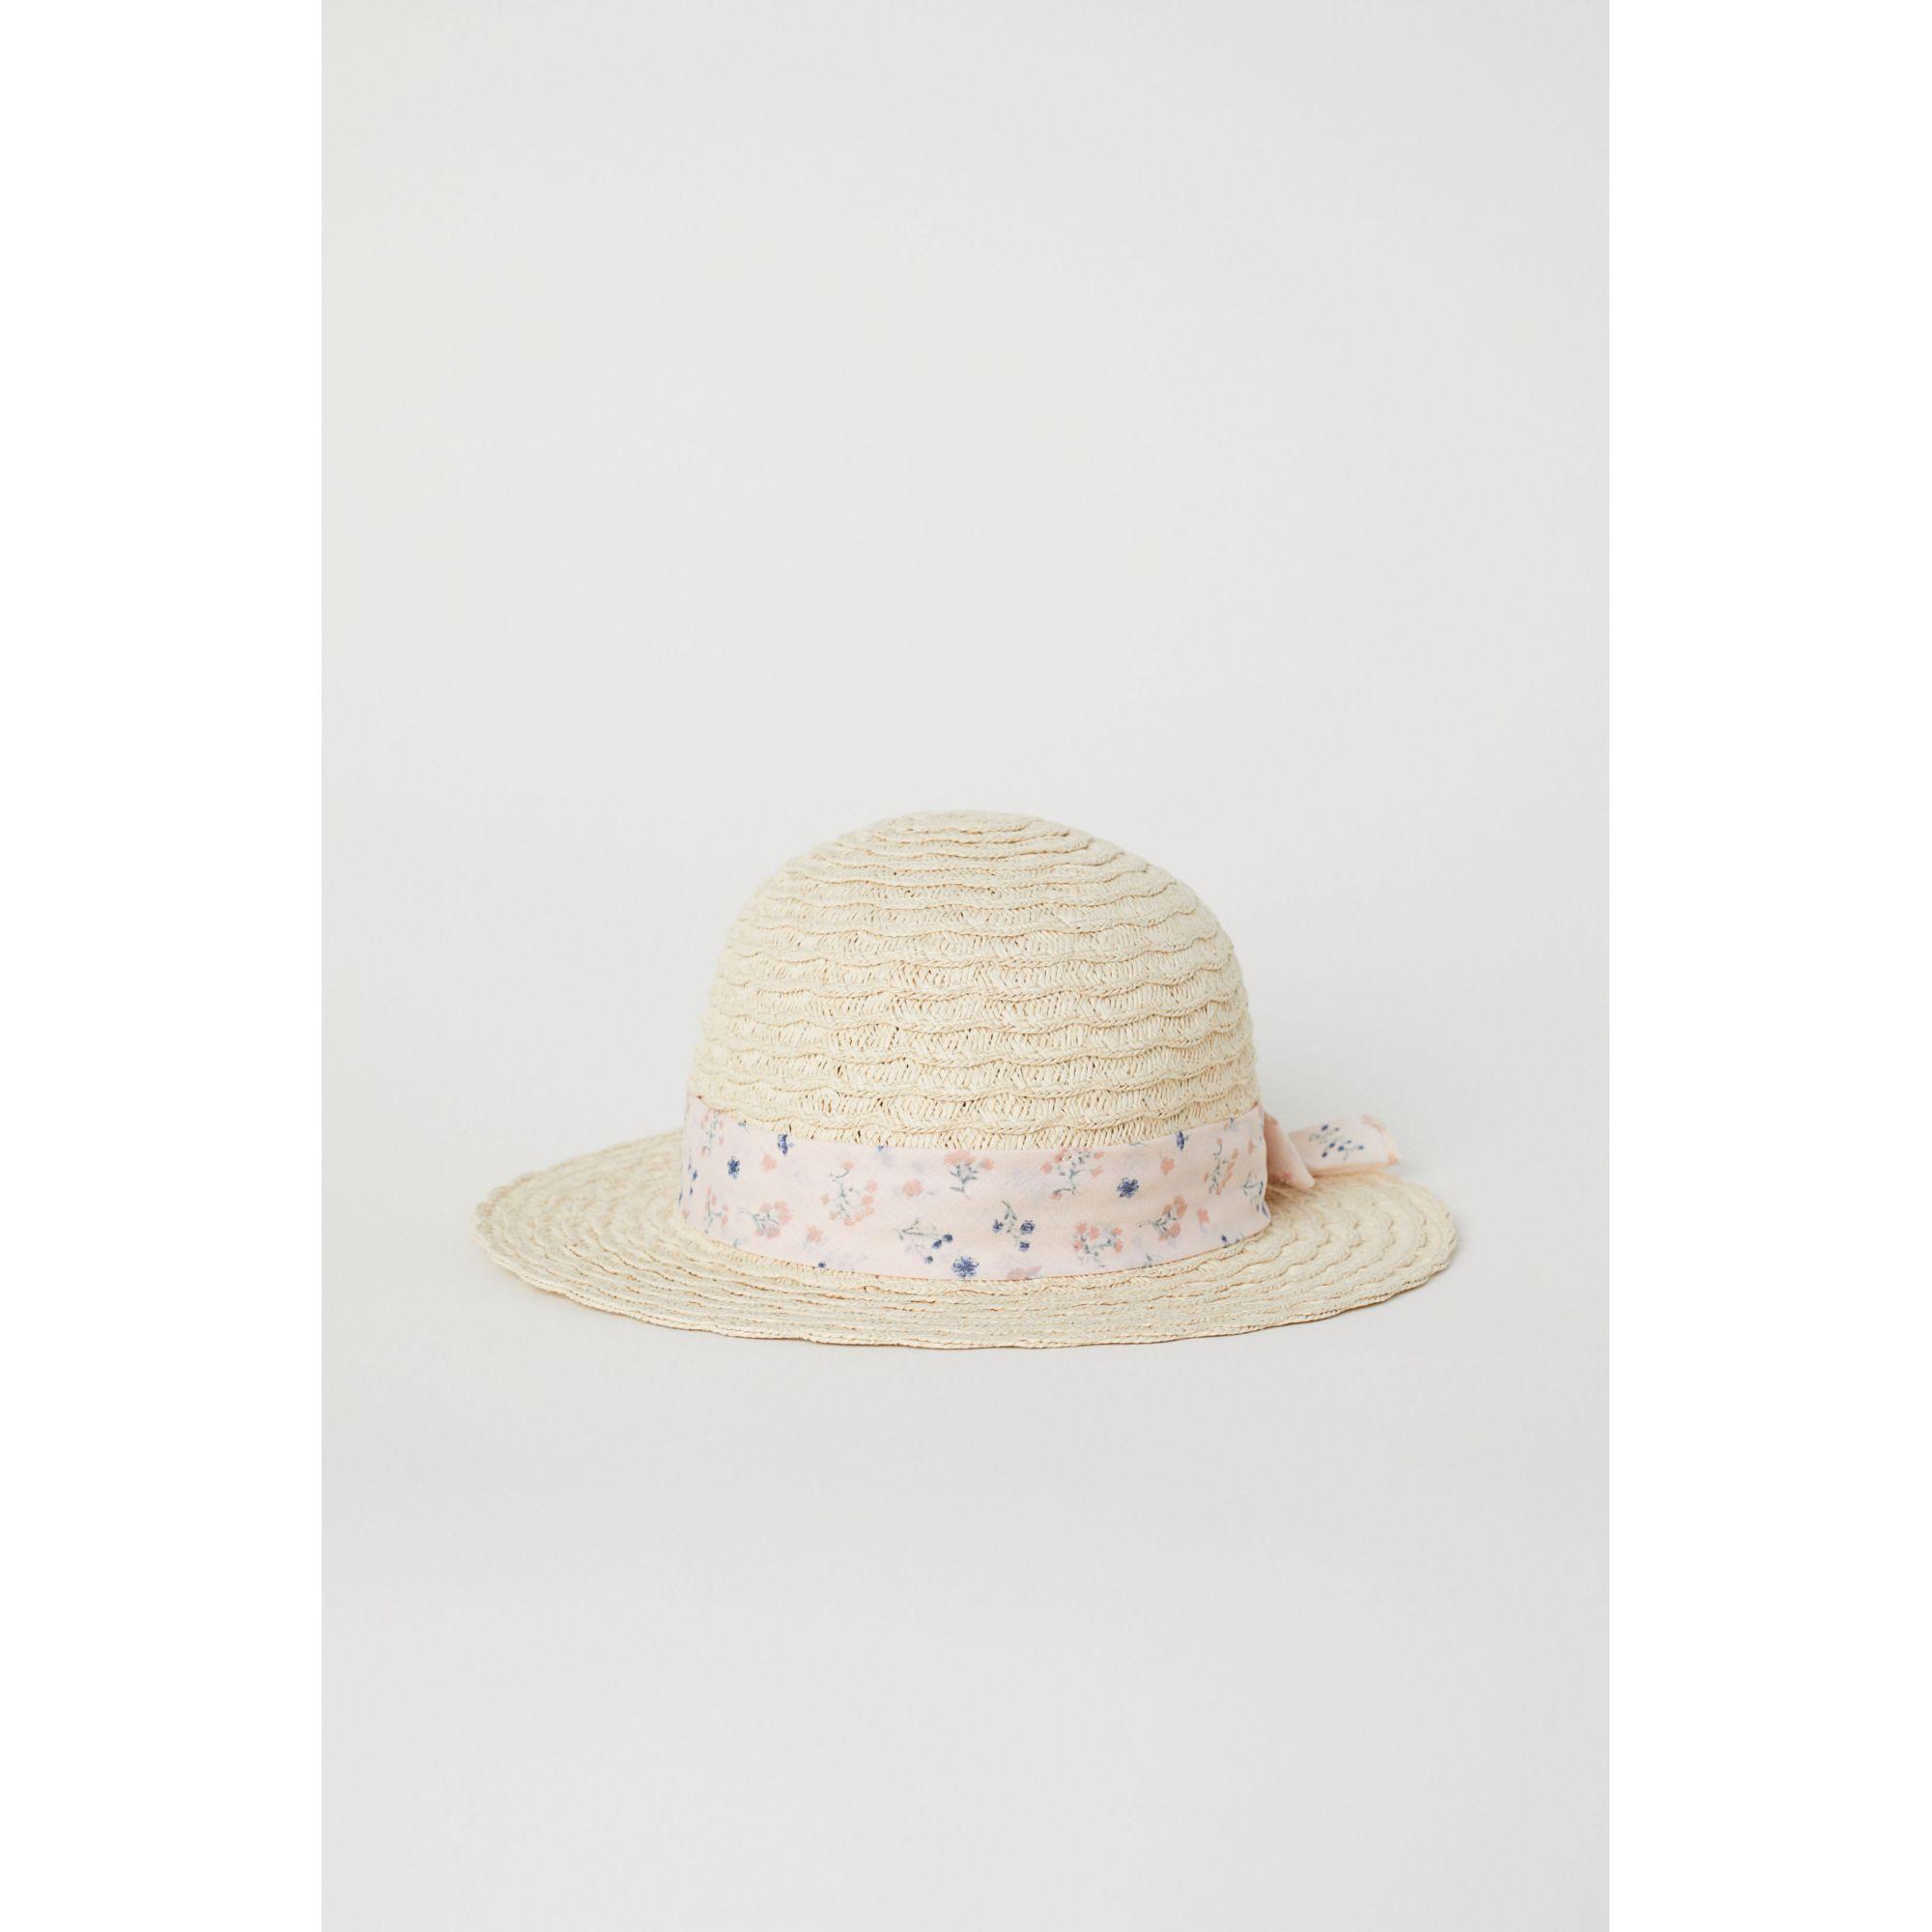 Chapéu de Palha Laço Rosa florido H&M